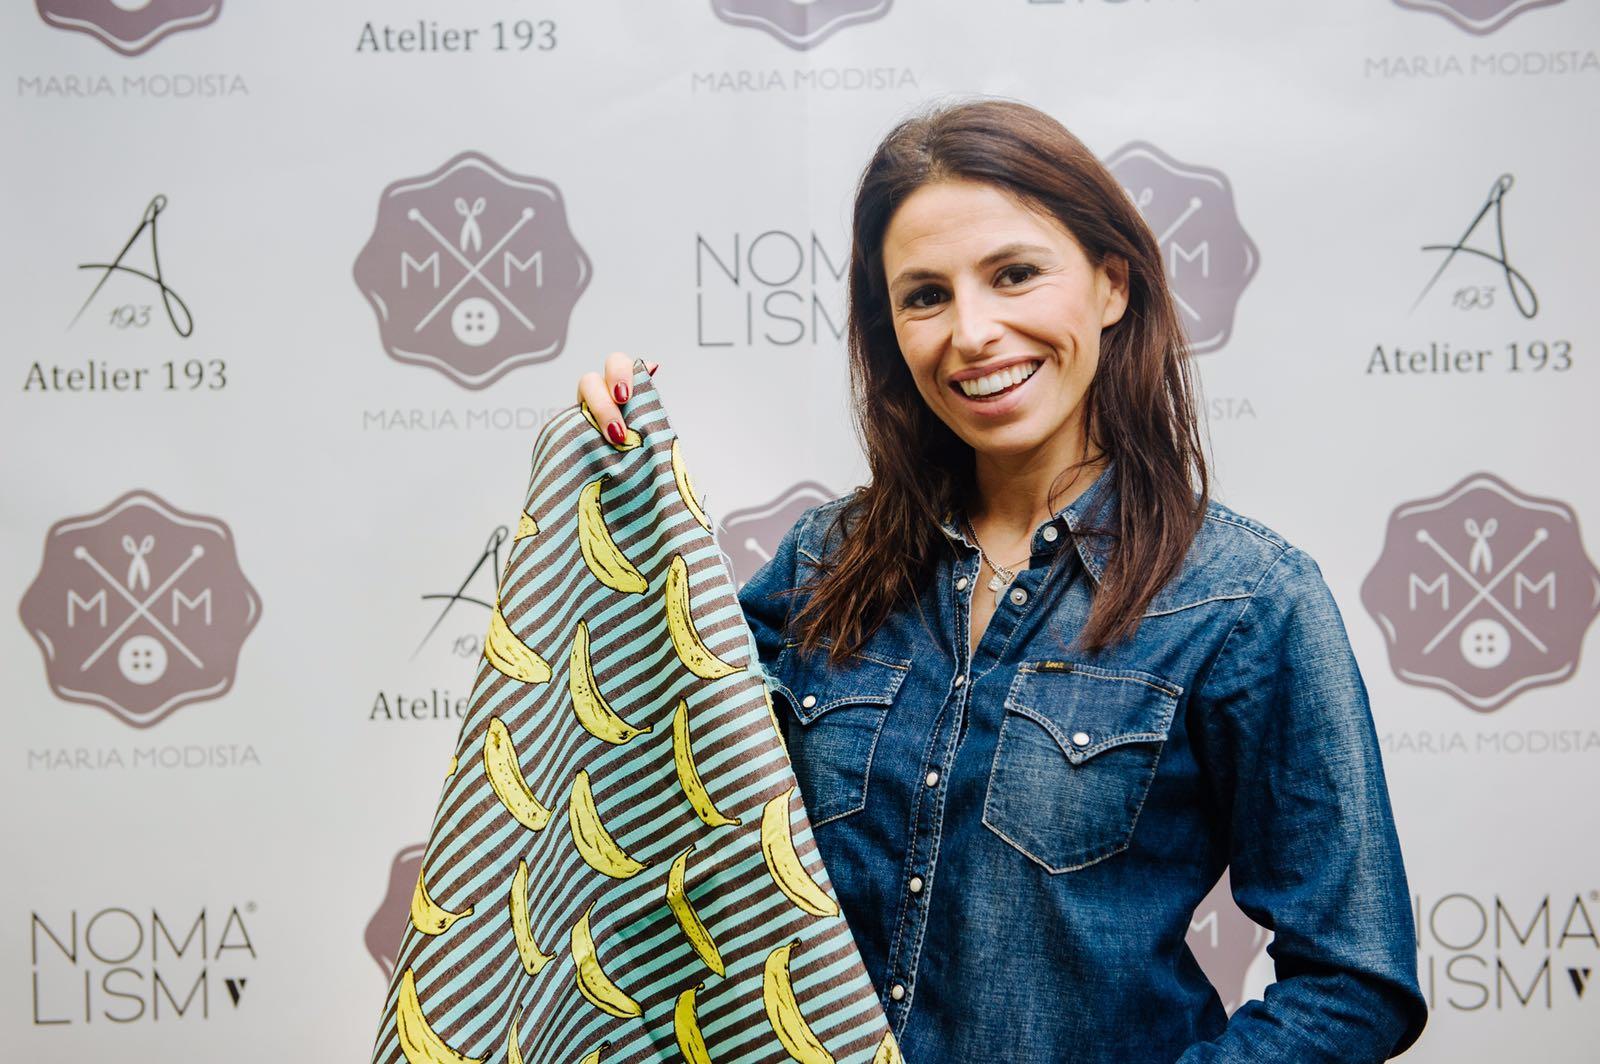 Pillow tailored by Joana Cruz